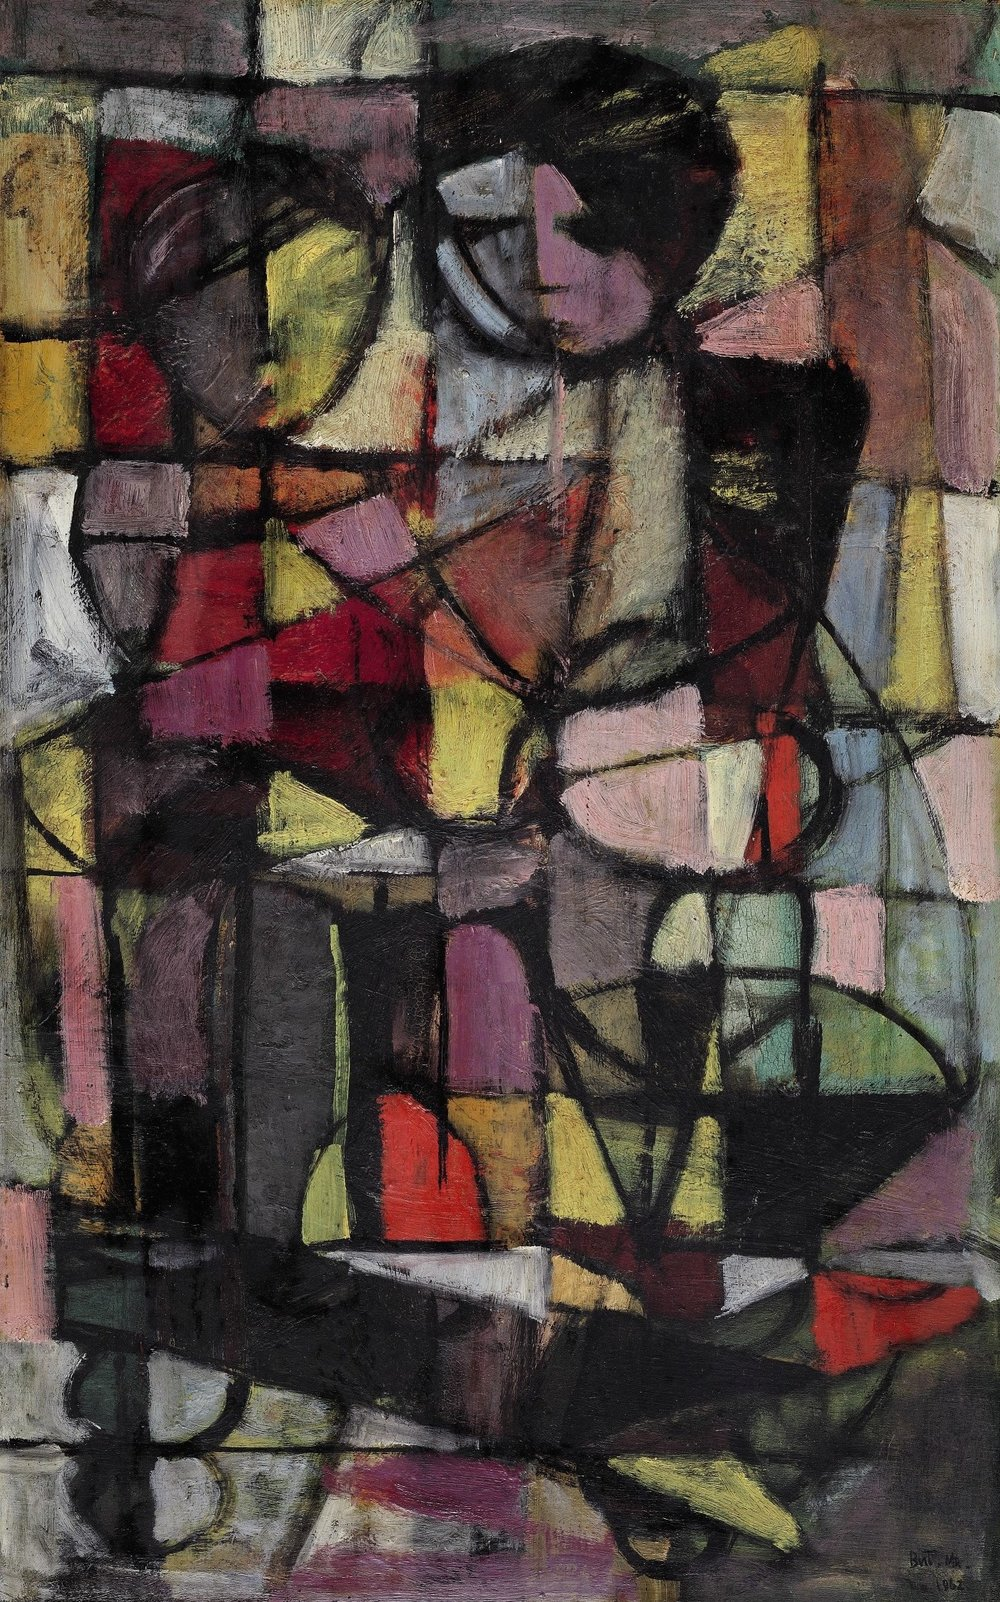 But Mochtar, Figures, oil on masonite board, 54.5 x 34.5 cm, 1962